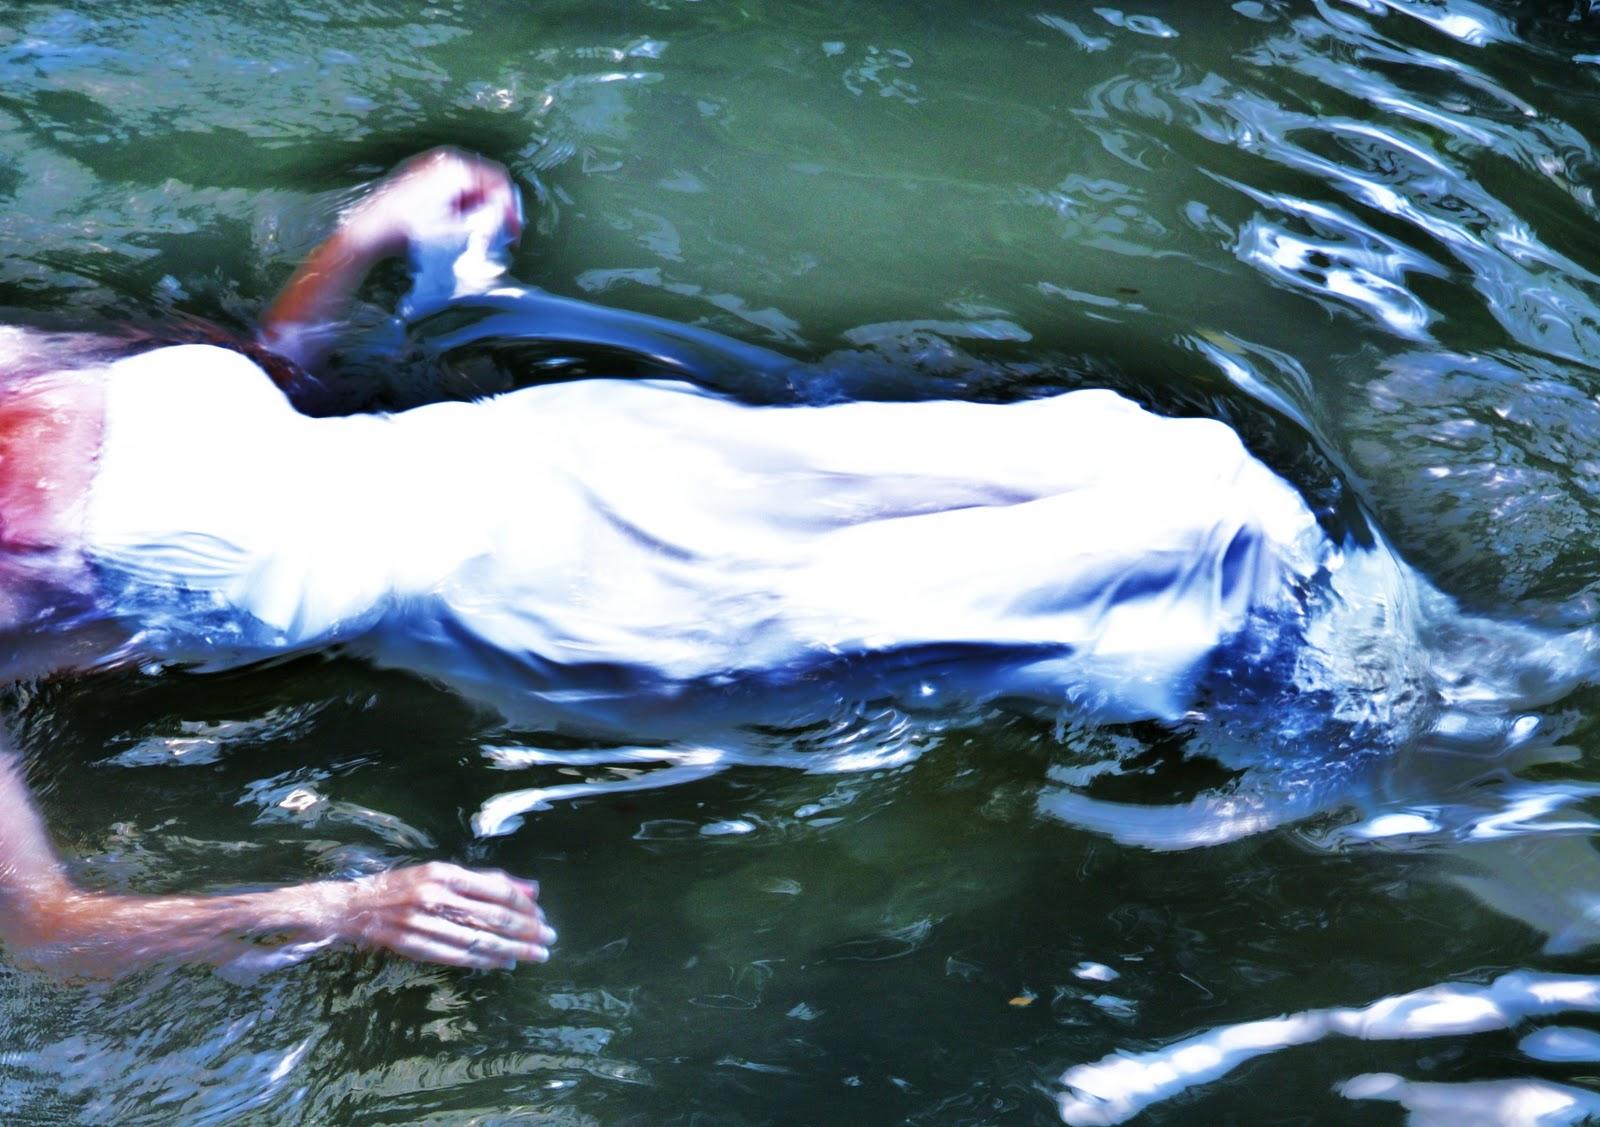 Are mermaids real 5 real cases of mermaid sightings - Are Mermaids Real 5 Real Cases Of Mermaid Sightings